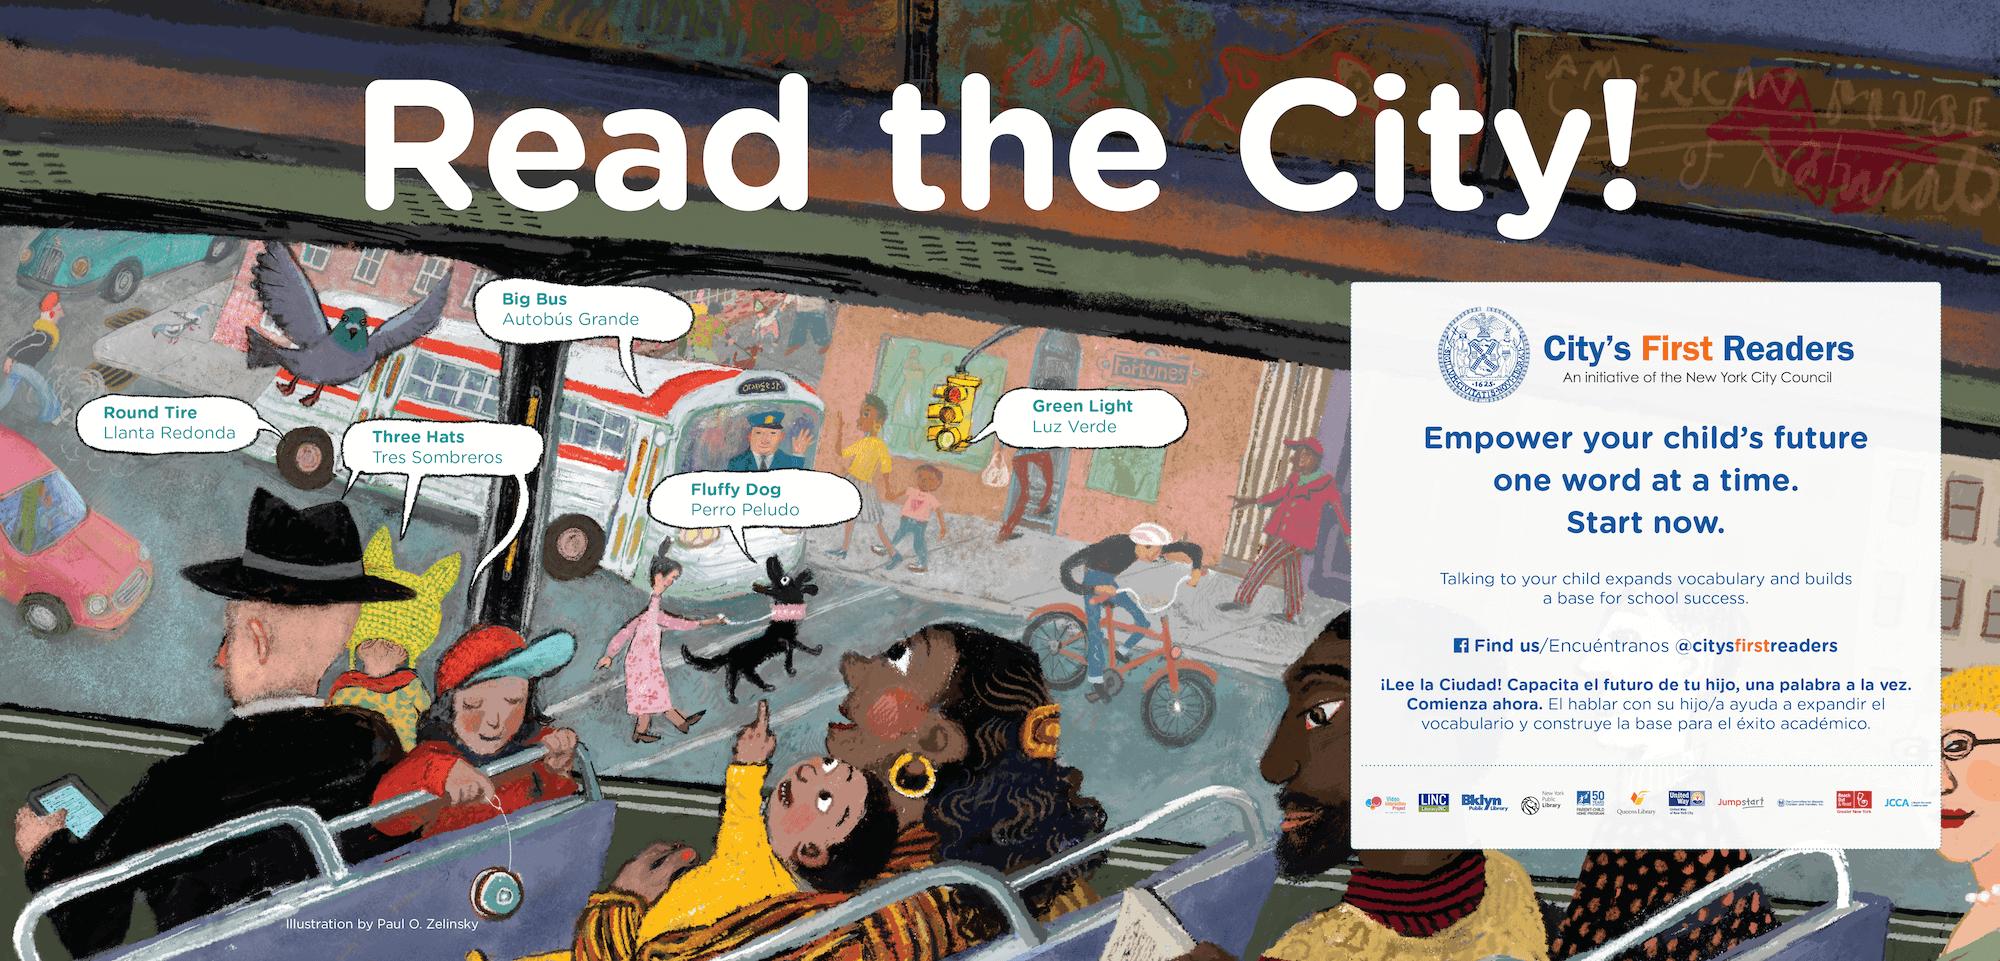 Read the City ad using Paul O. Zelinsky art